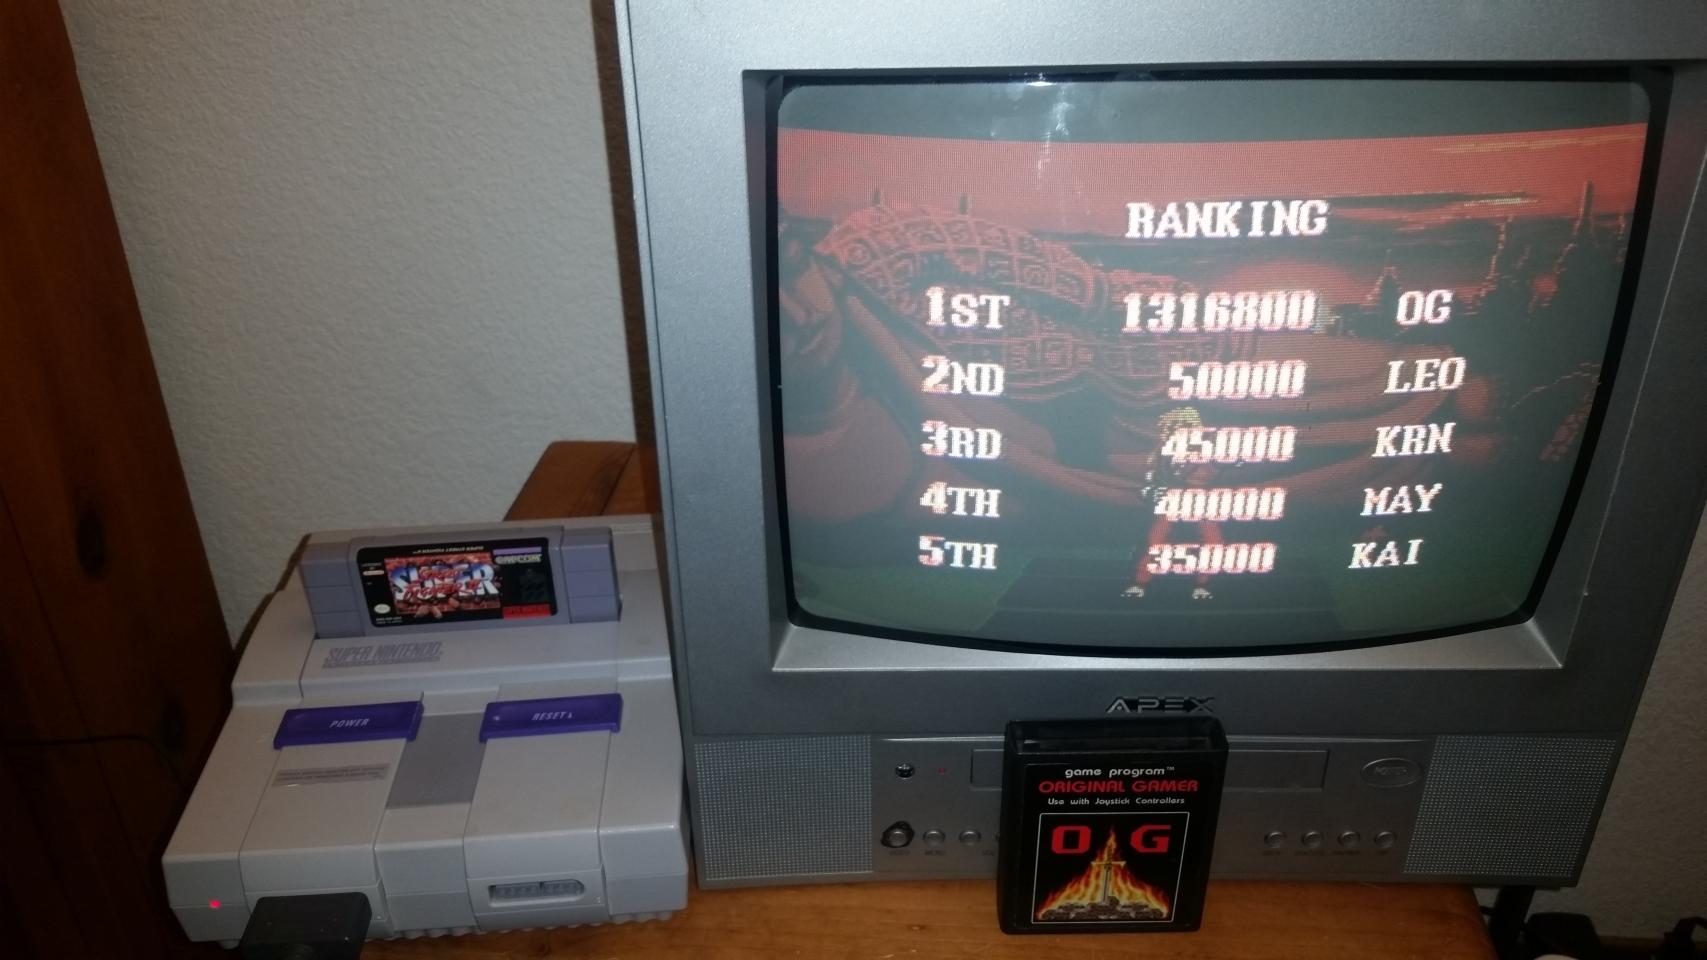 OriginalGamer: Super Street Fighter II: The New Challengers [Super Battle: Difficulty 1] (SNES/Super Famicom) 1,316,800 points on 2017-12-17 00:08:59